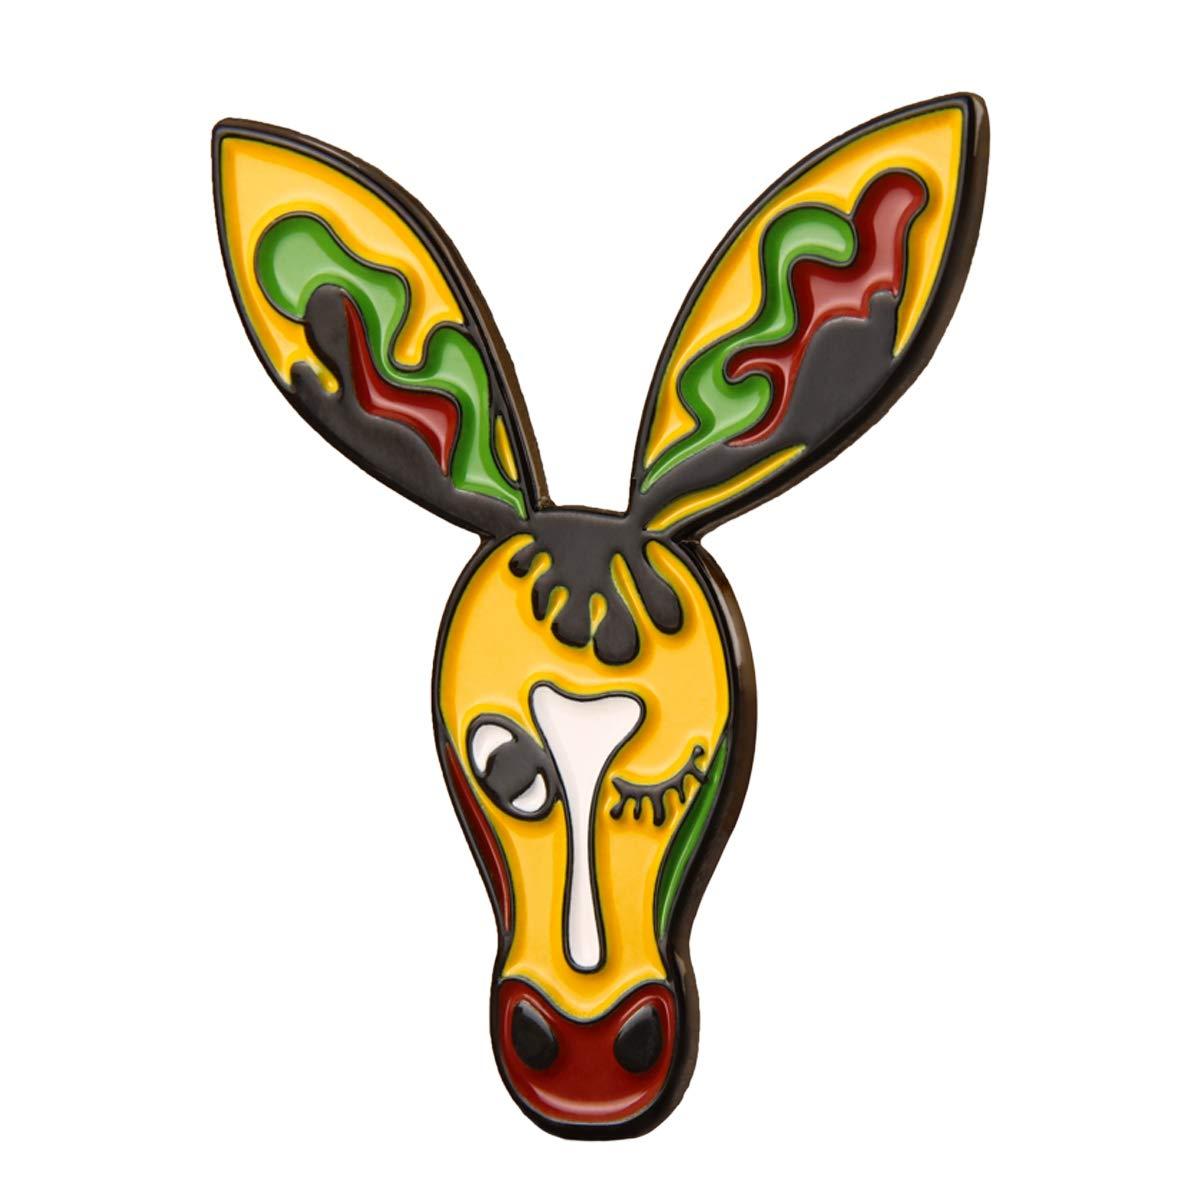 GS-JJ Drama Donkey Enamel Lapel Pin 1.5 B07G8SMG1B_US